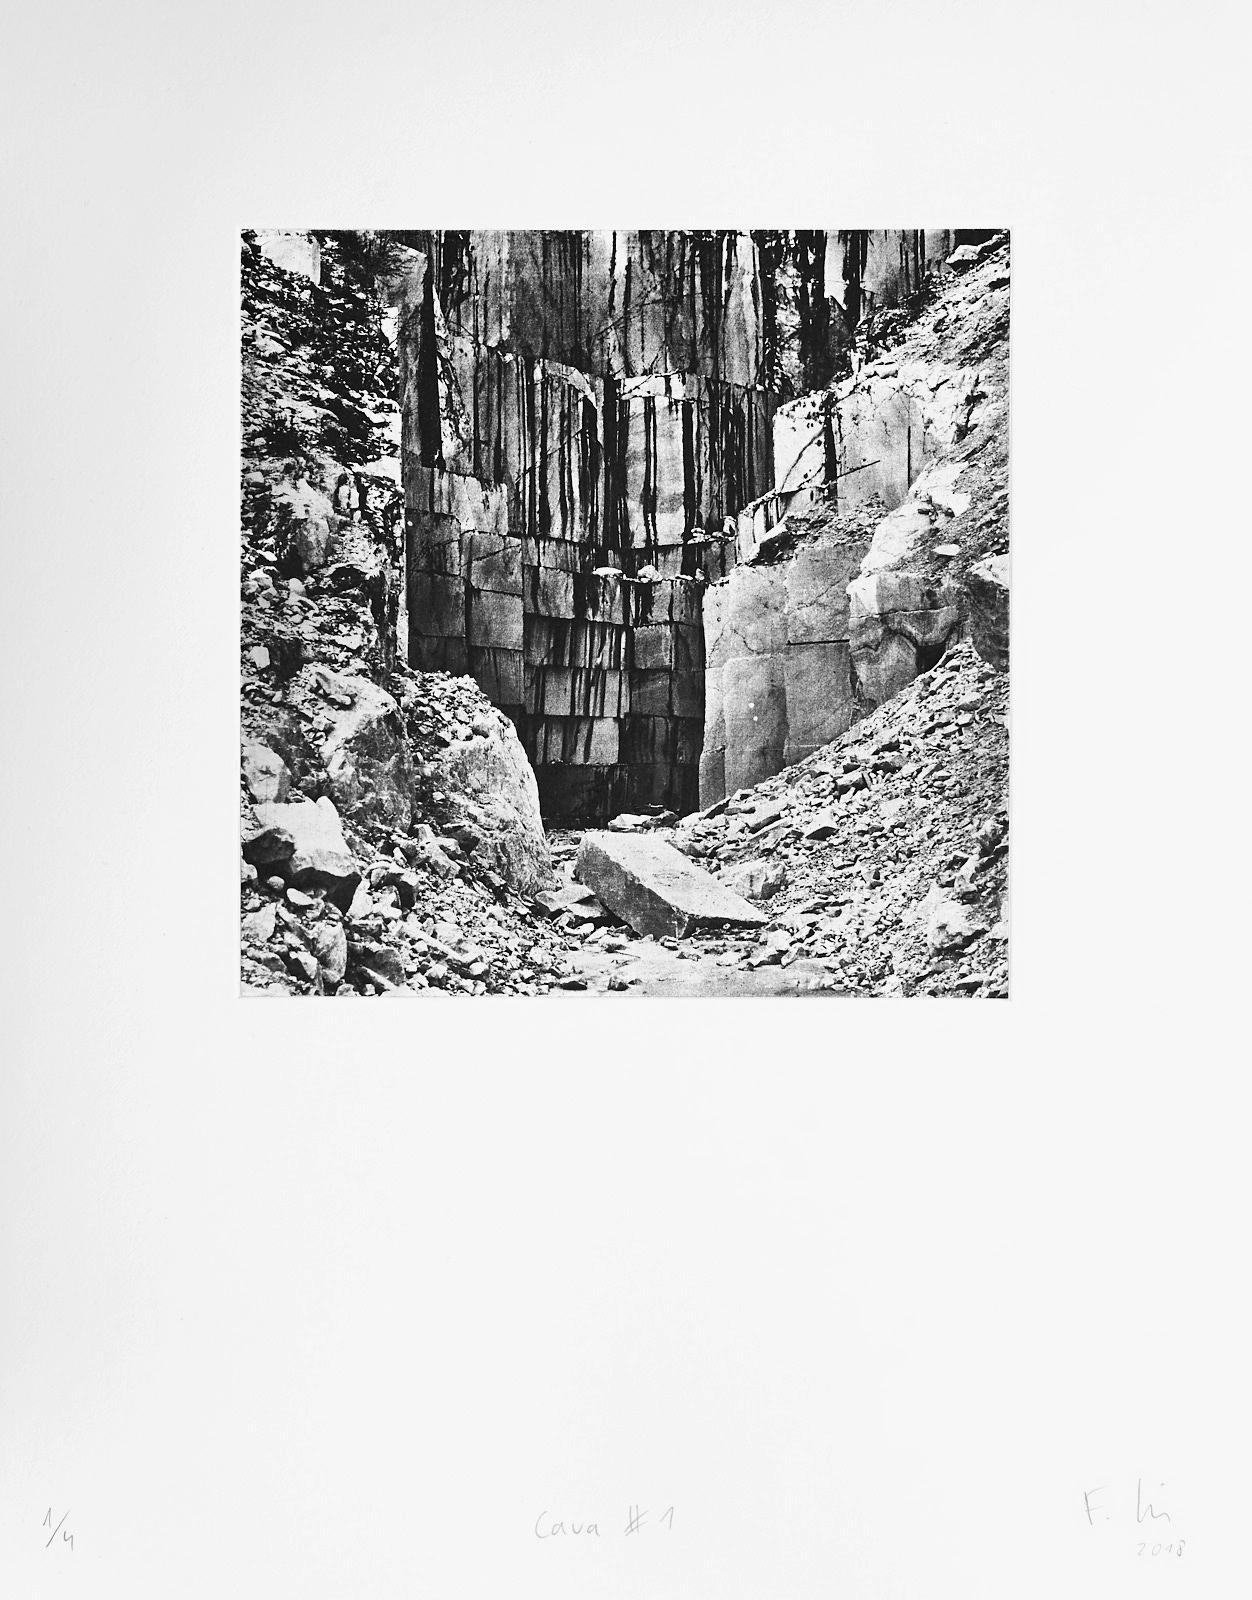 Cava #1 (2018)  medium: Photogravure  size: 36 x 46 cm  paper: Zerkall 270 g/qm  plate: 21.5 x 21.5 cm  edition: 7 copies  numbered: 1/4 - 4/4, 3 e.a.  printer: FWU